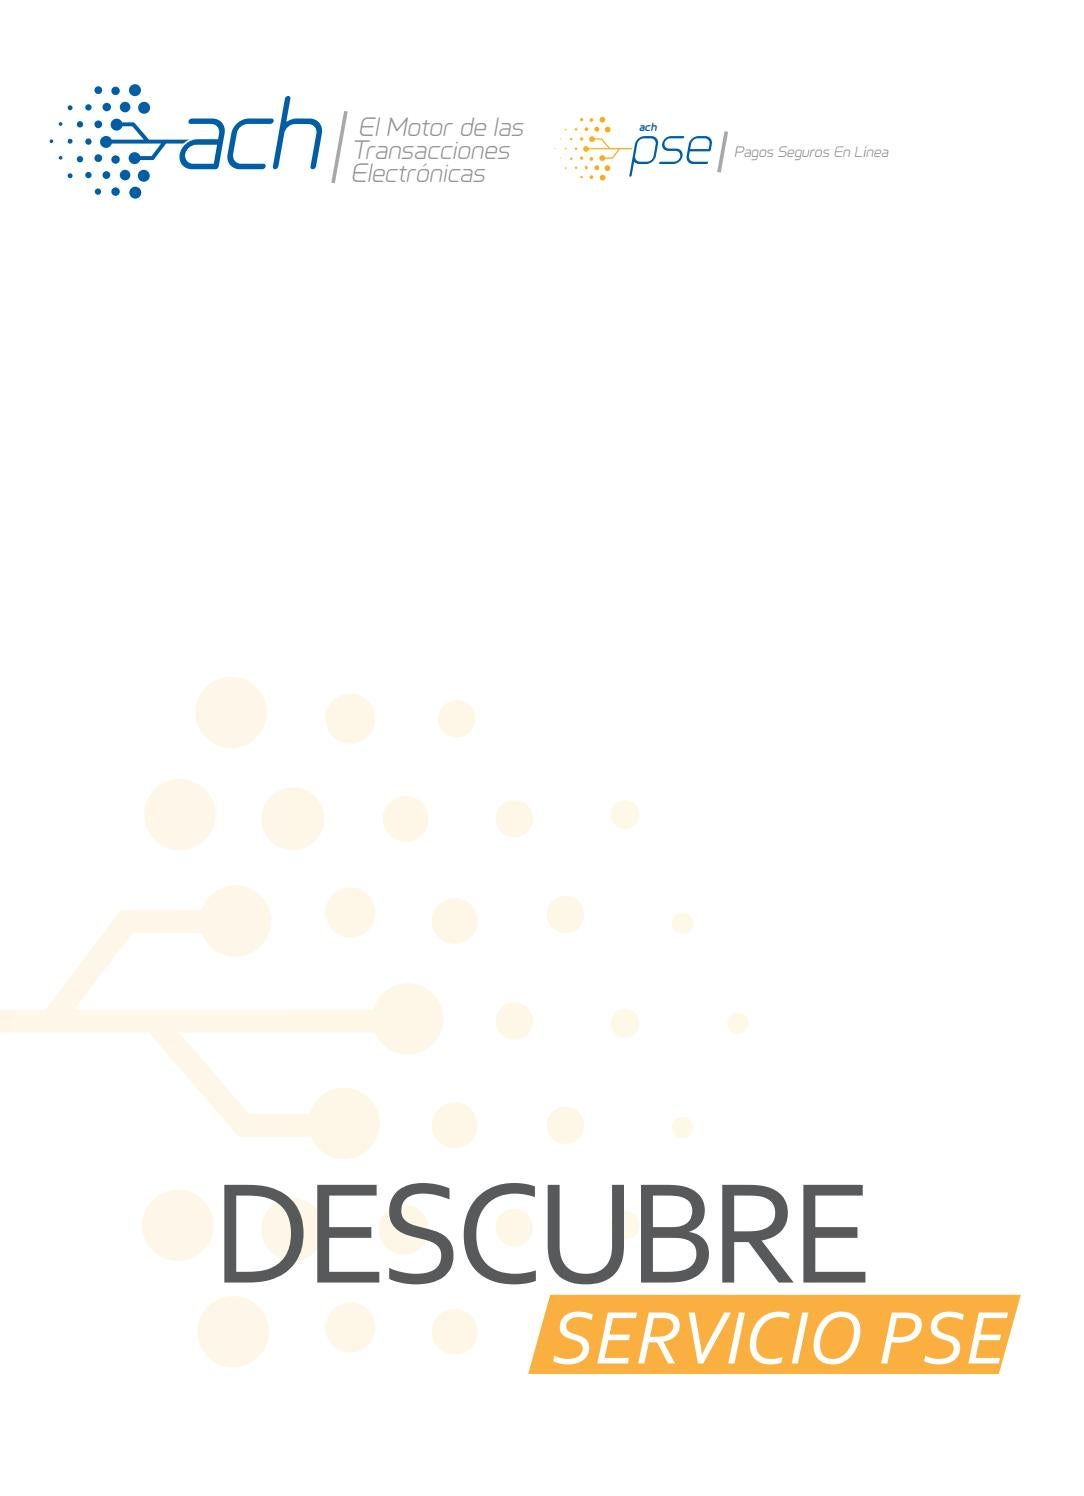 Descubre servicio pse by ACH Colombia - issuu